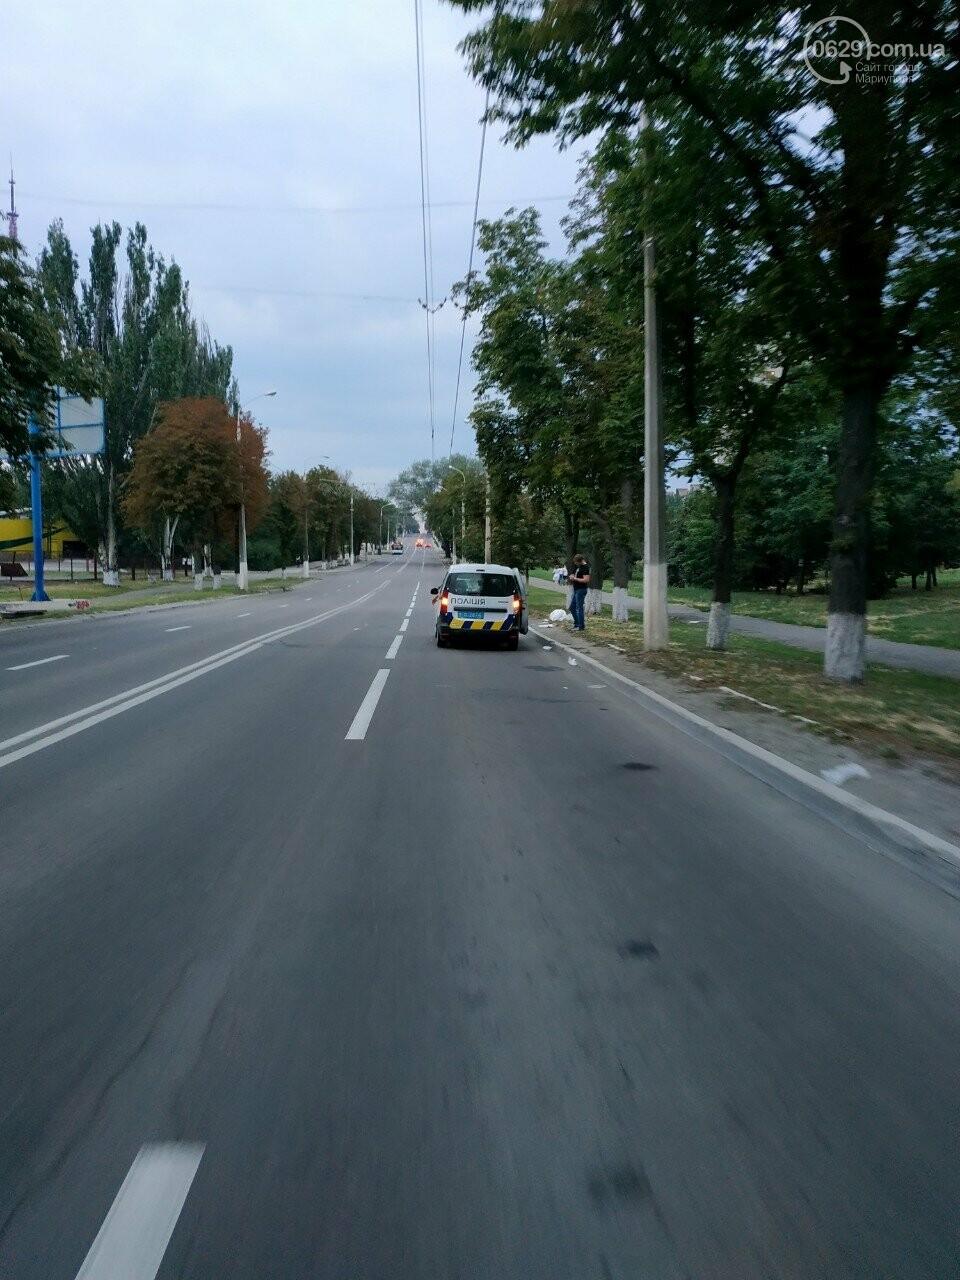 В Мариуполе под колеса «Славуты» попал пешеход, - ФОТО, фото-9